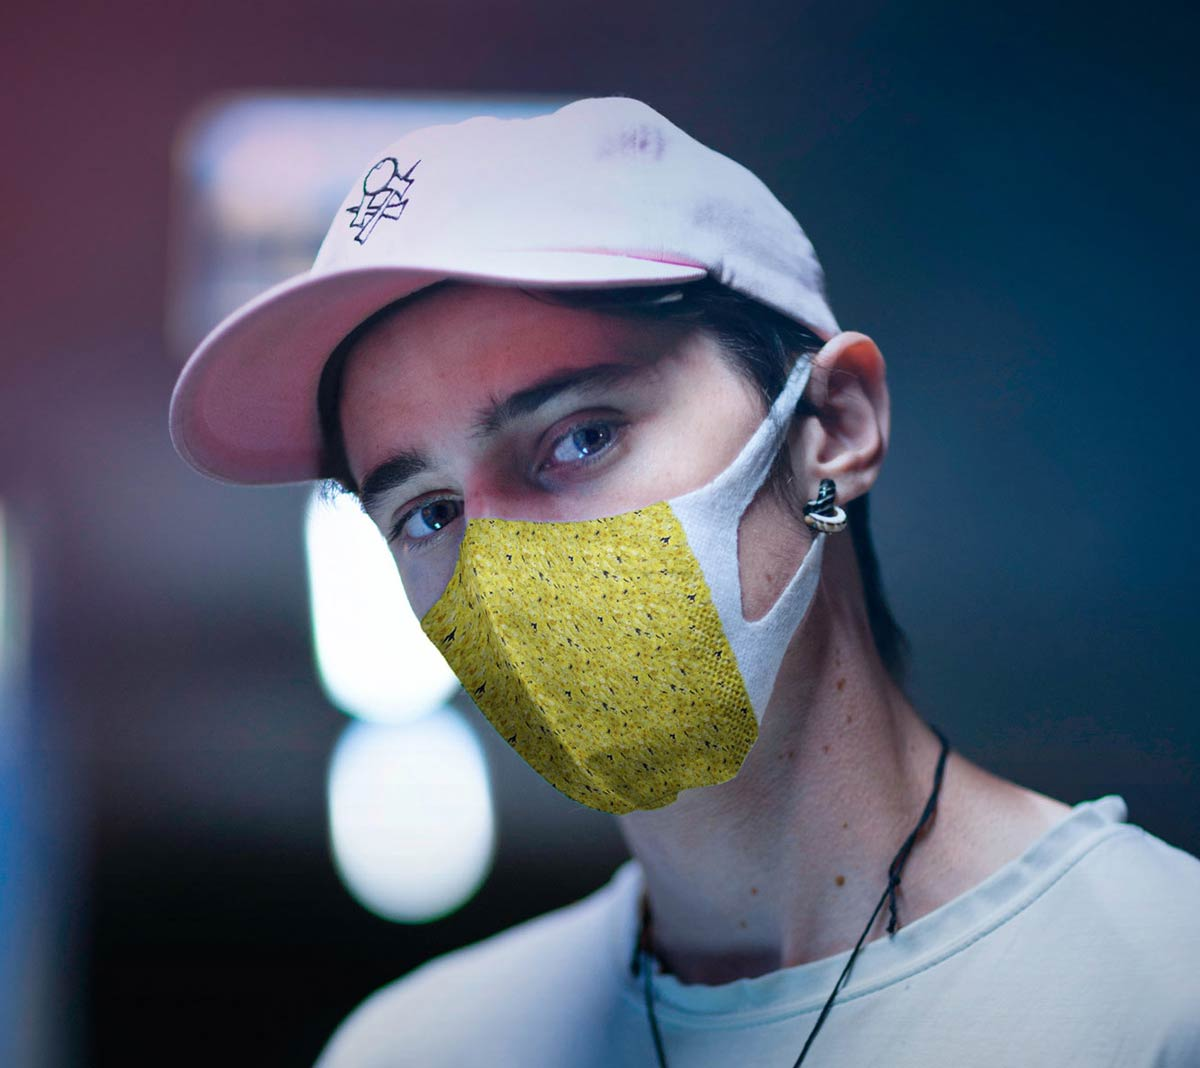 Guy-in-a-Face-Mask-Mockup